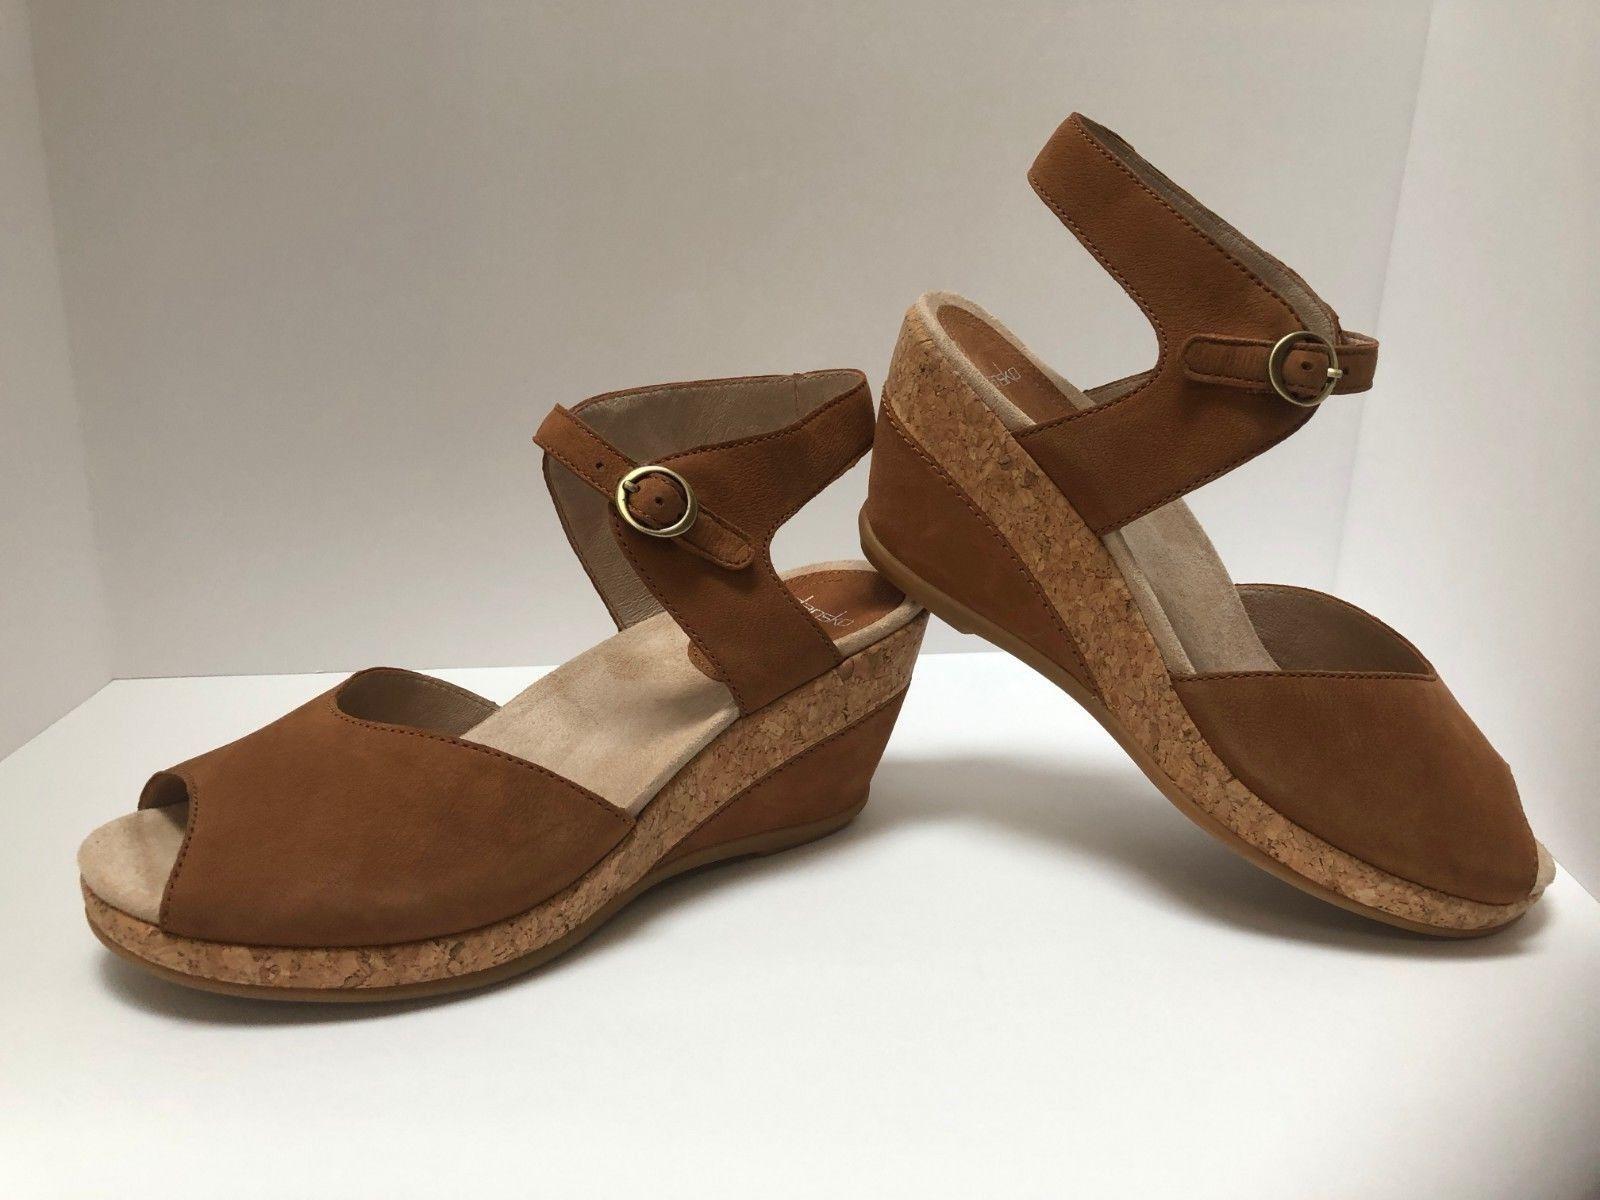 Dansko Women's Charlotte Ankle Strap Wedge Sandals Camel Nub